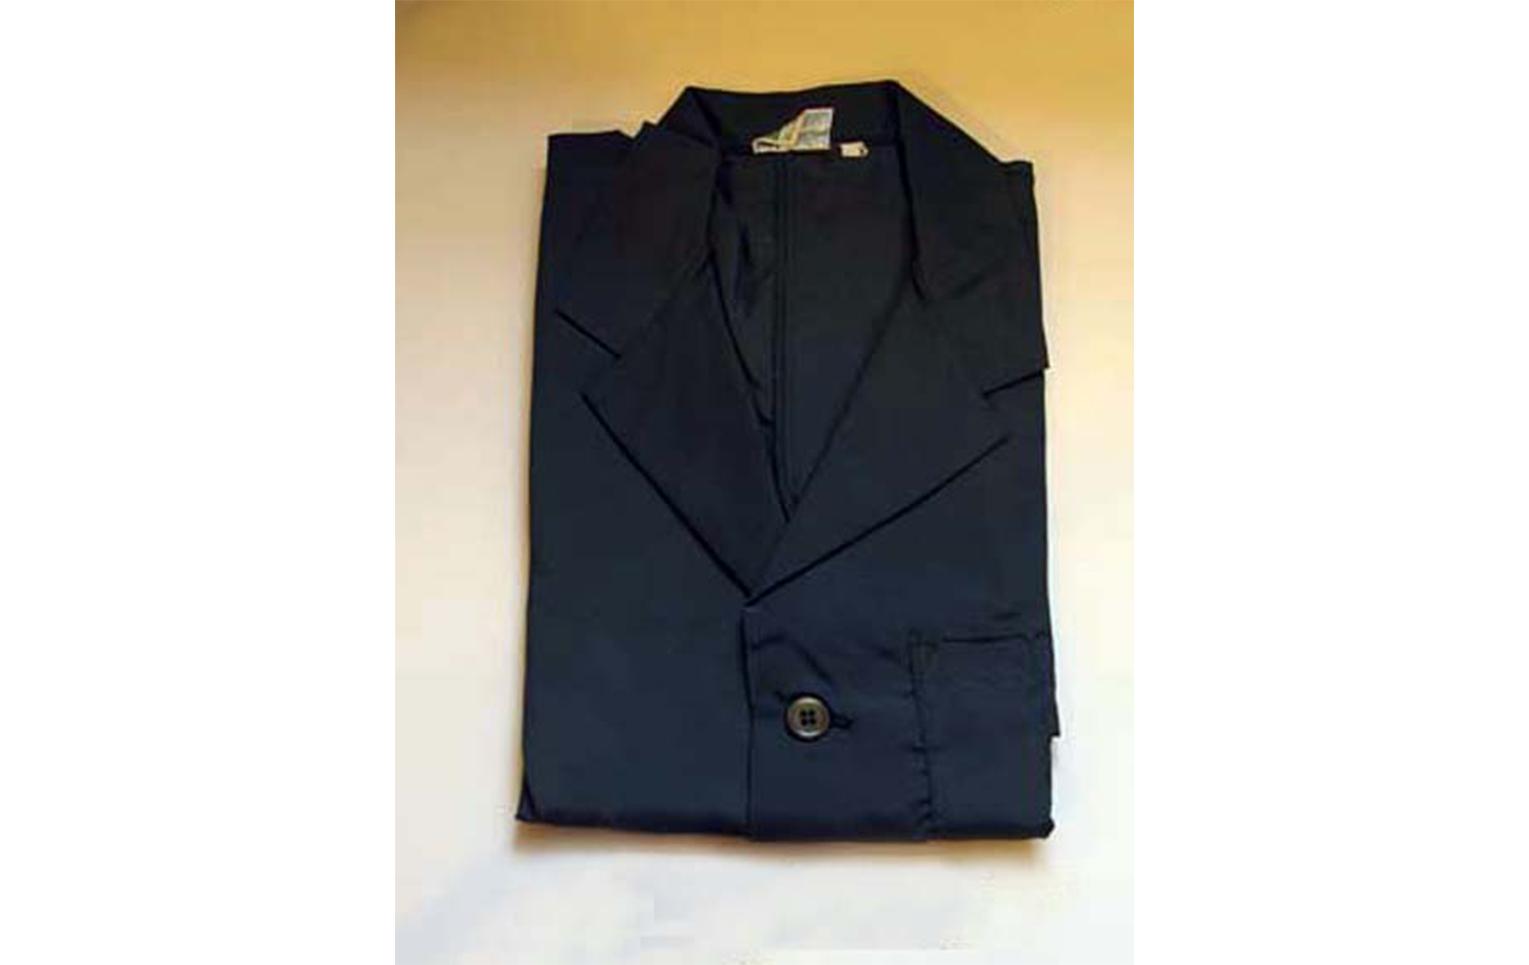 Warehouseman's coat by Alexandra Workwear Ltd, worn as uniform by warding staff at Sir John Soane's Museum